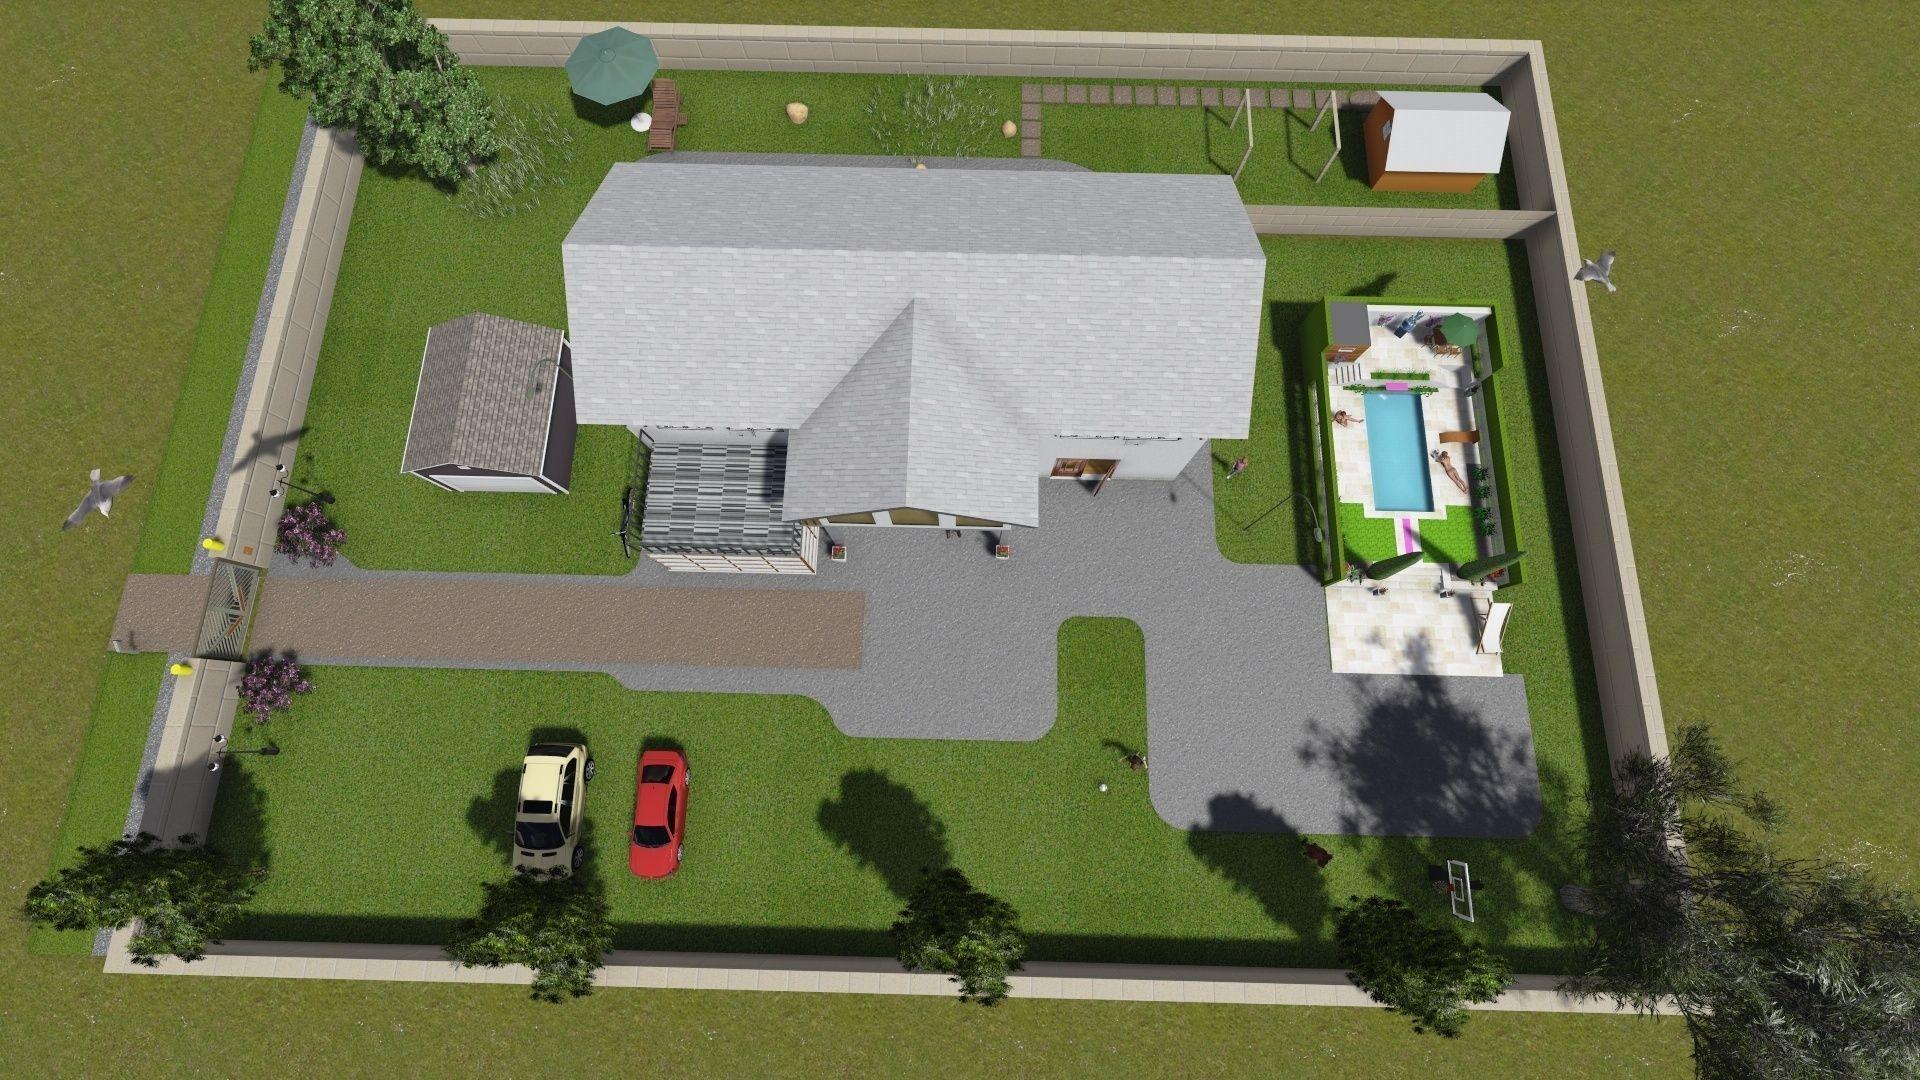 Simple house 3d model skp 17